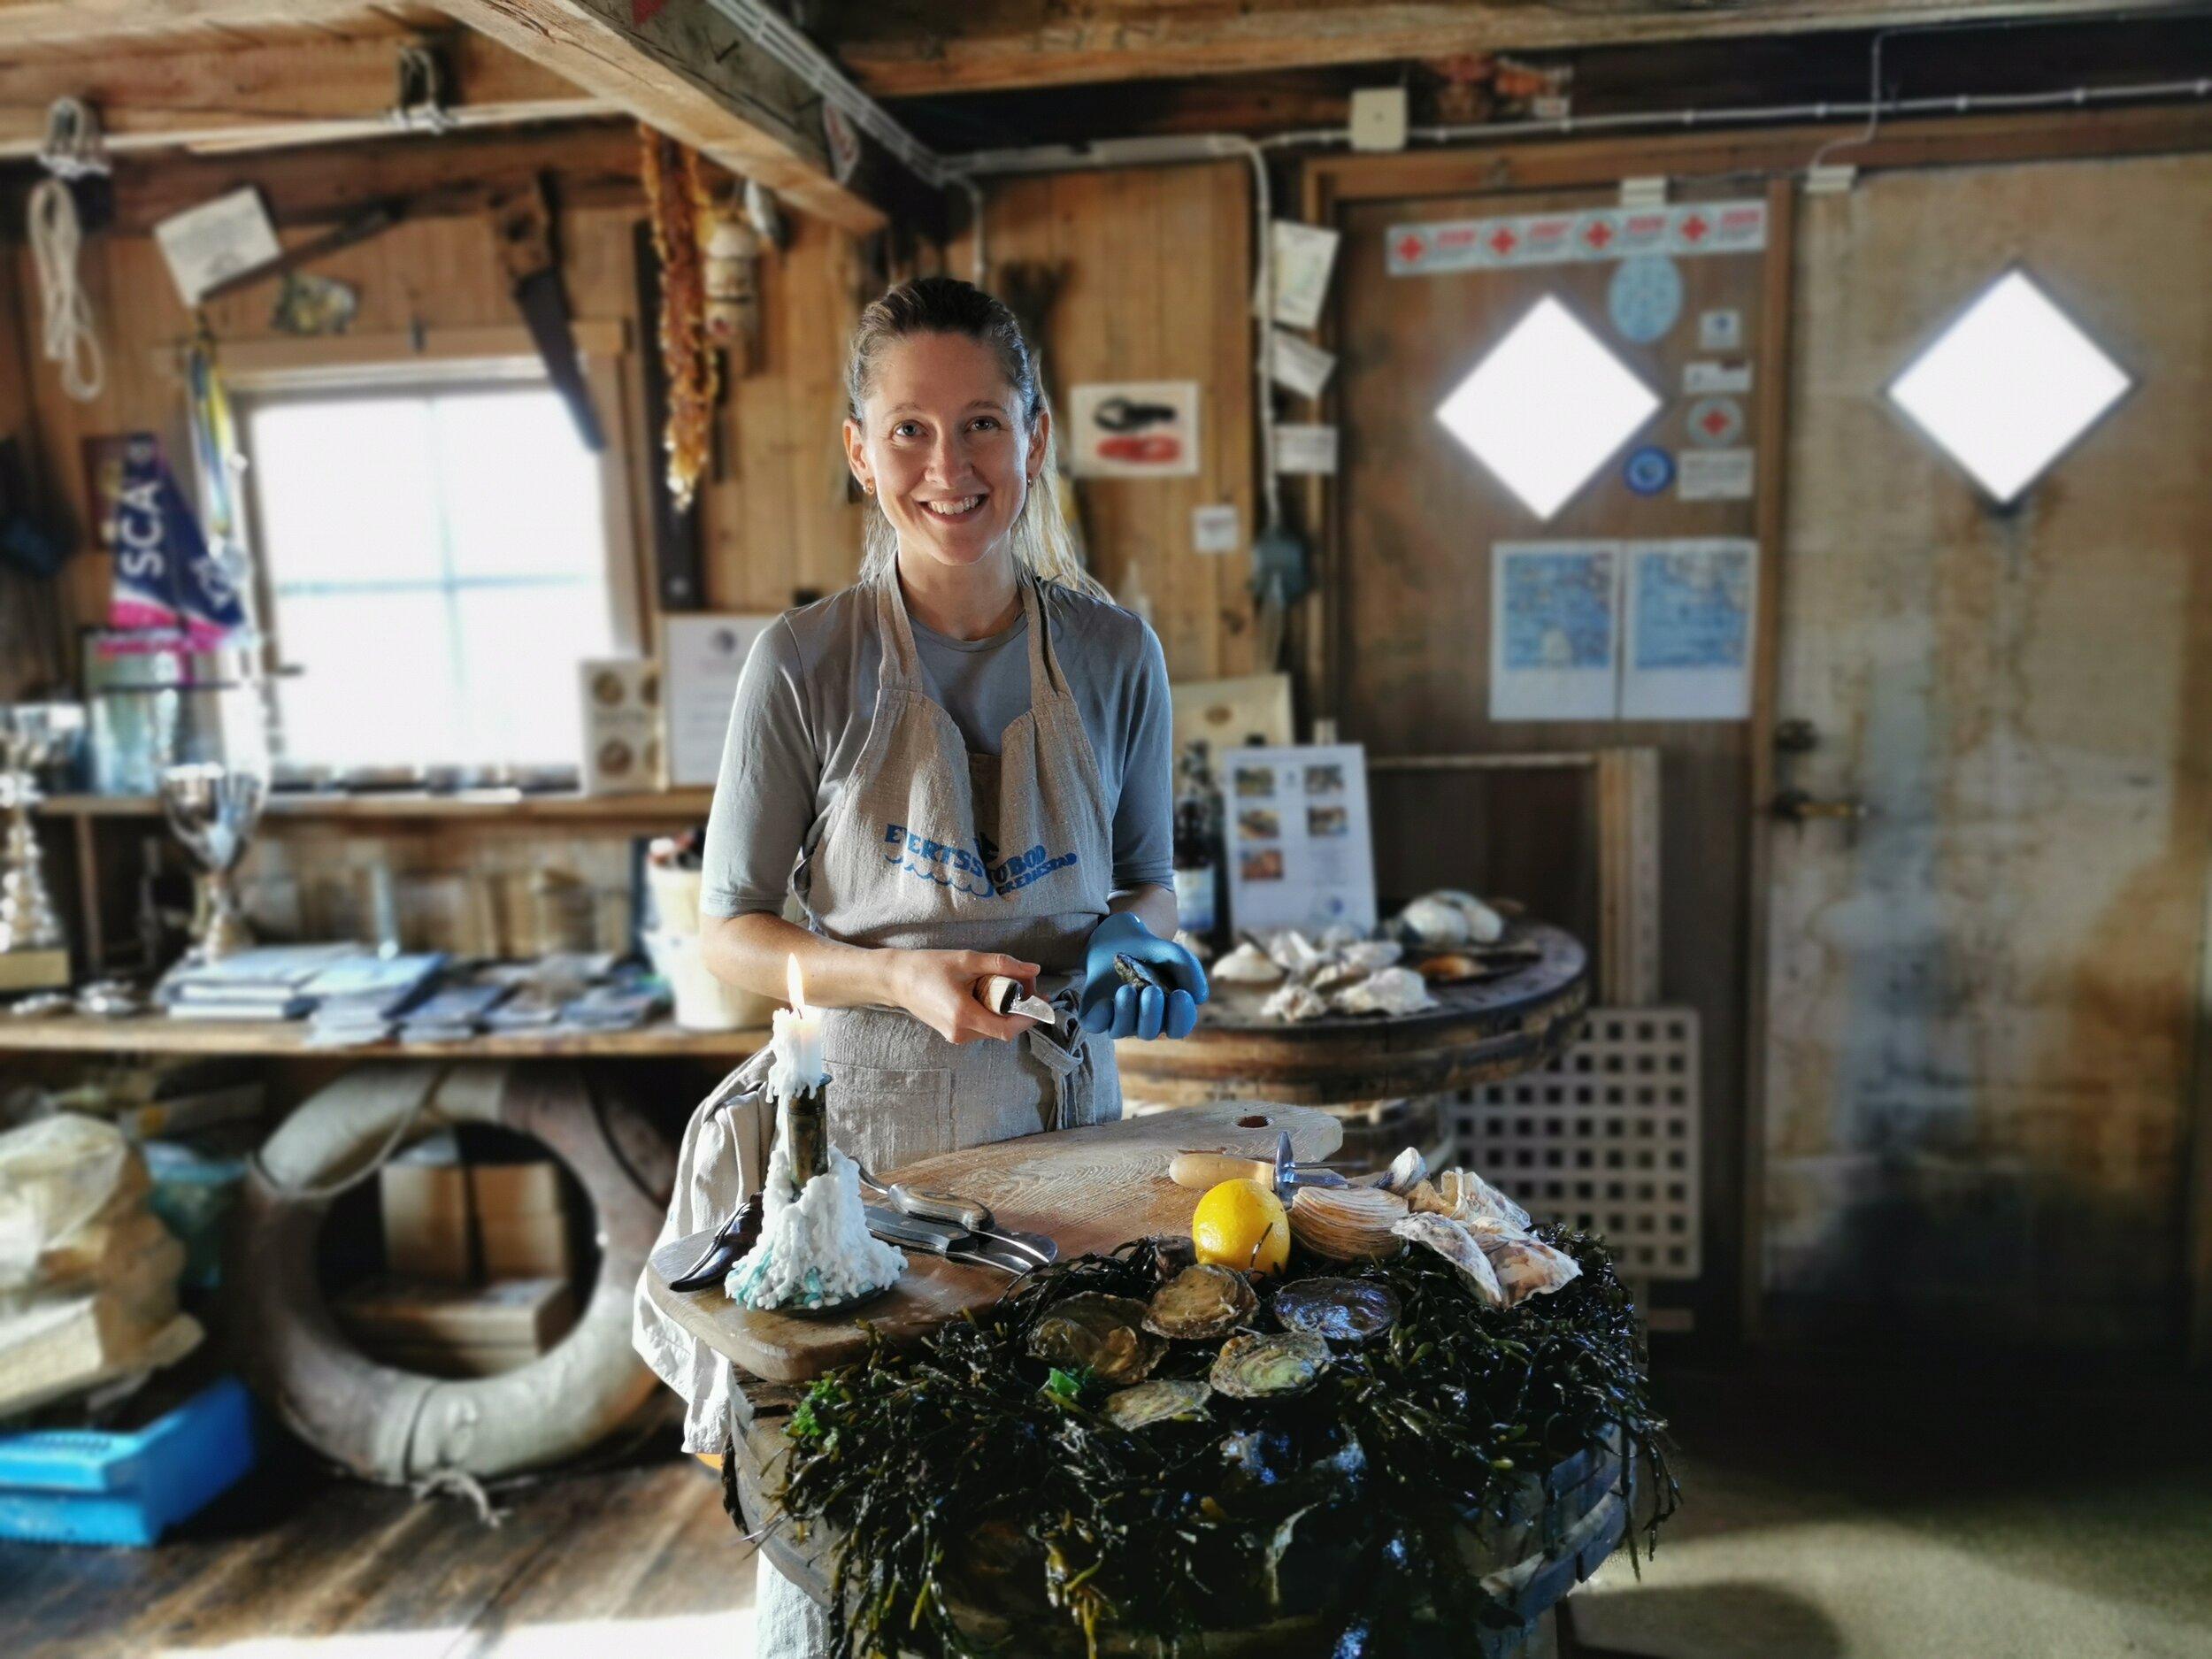 Hummer og østers. Hanna Karlsson Thorén tar deg med på høstens natur- og gourmeteventyr i Everts Sjøbod. Foto: Odd Roar Lange